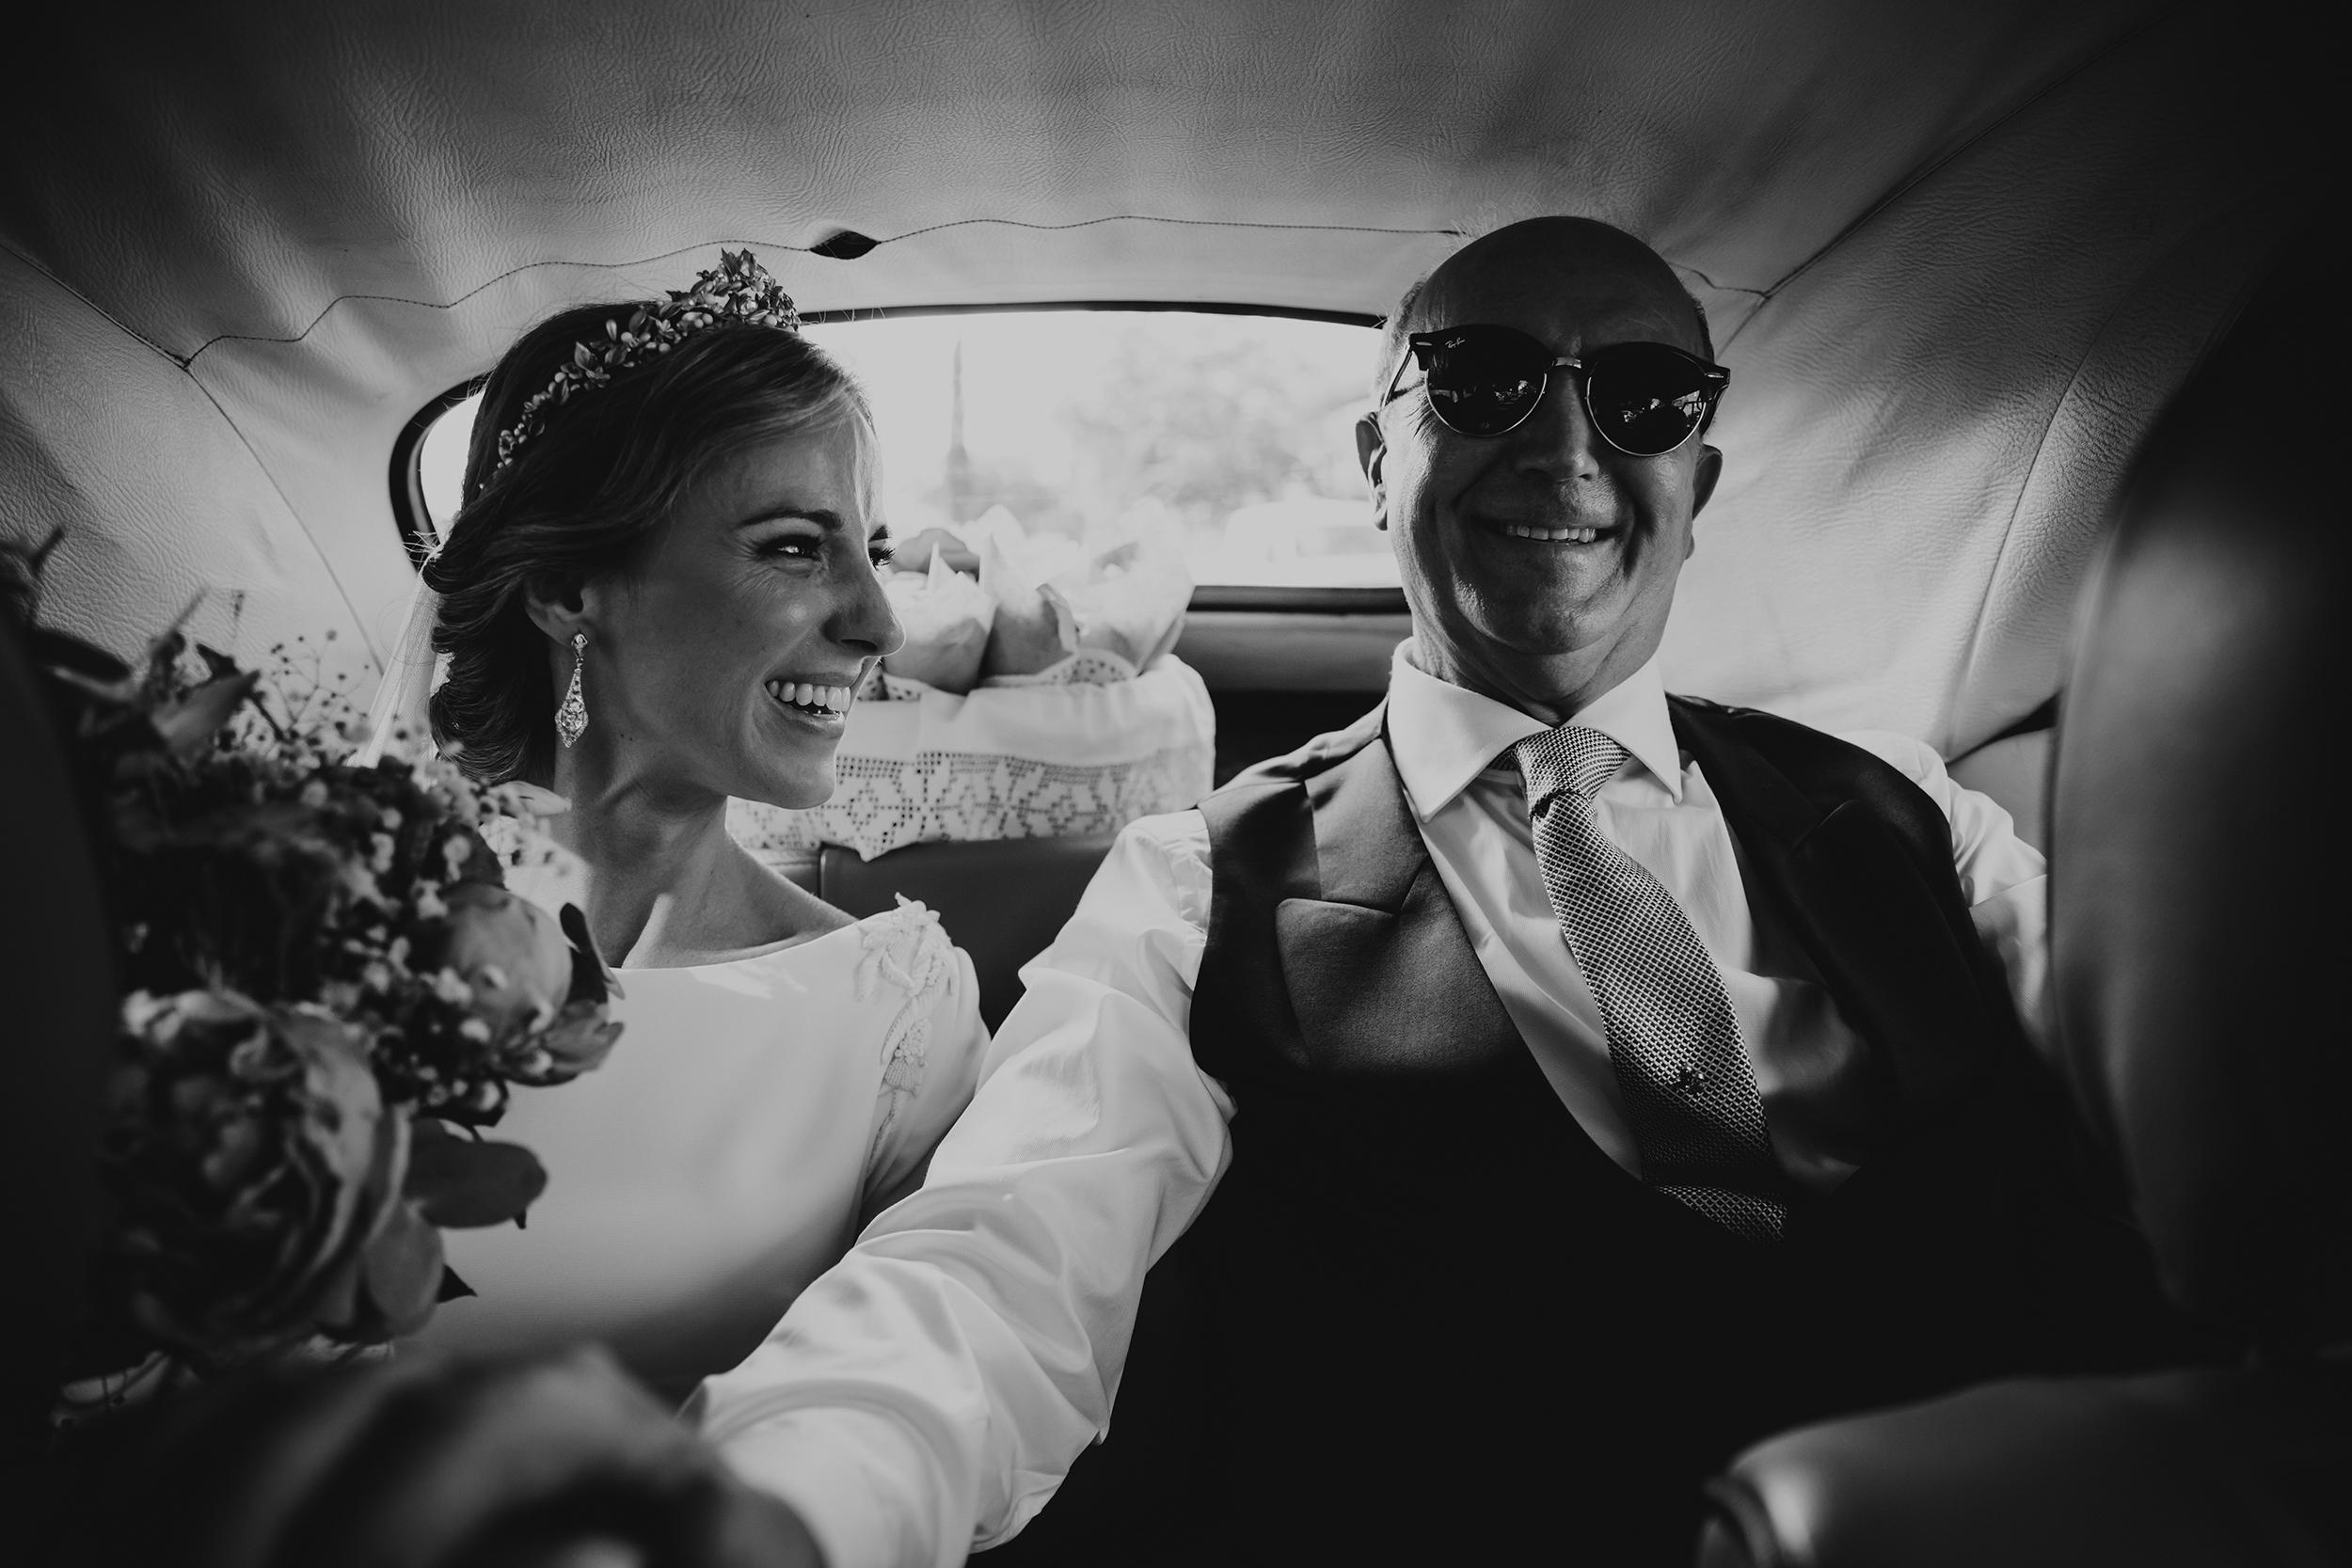 fotografo-bodas-granada-catedral-sagrario-jose-reyes_024.jpg